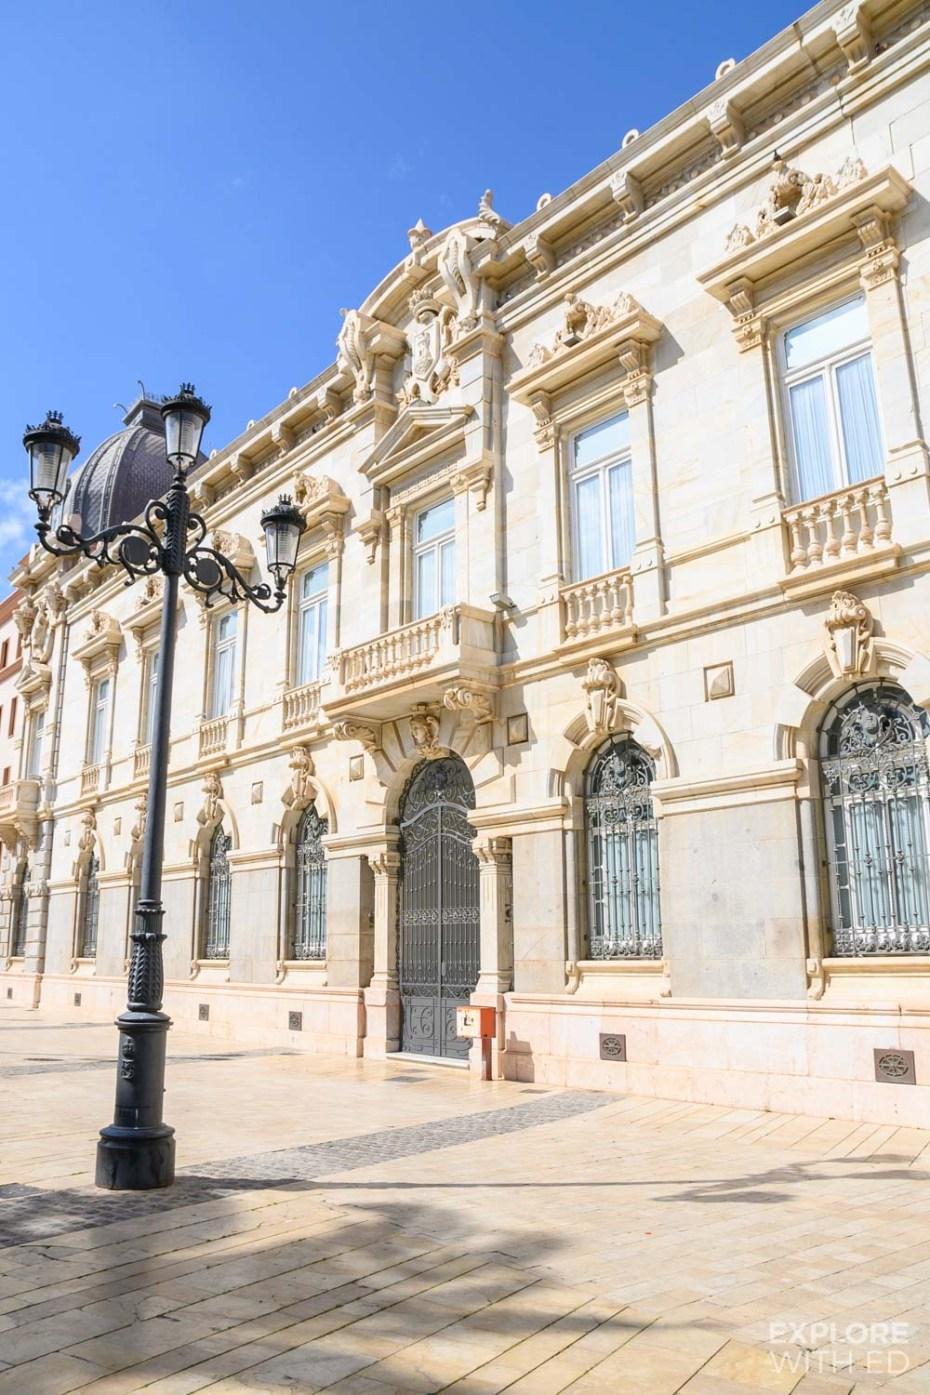 Beautiful stone buildings in Cartagena, Spain